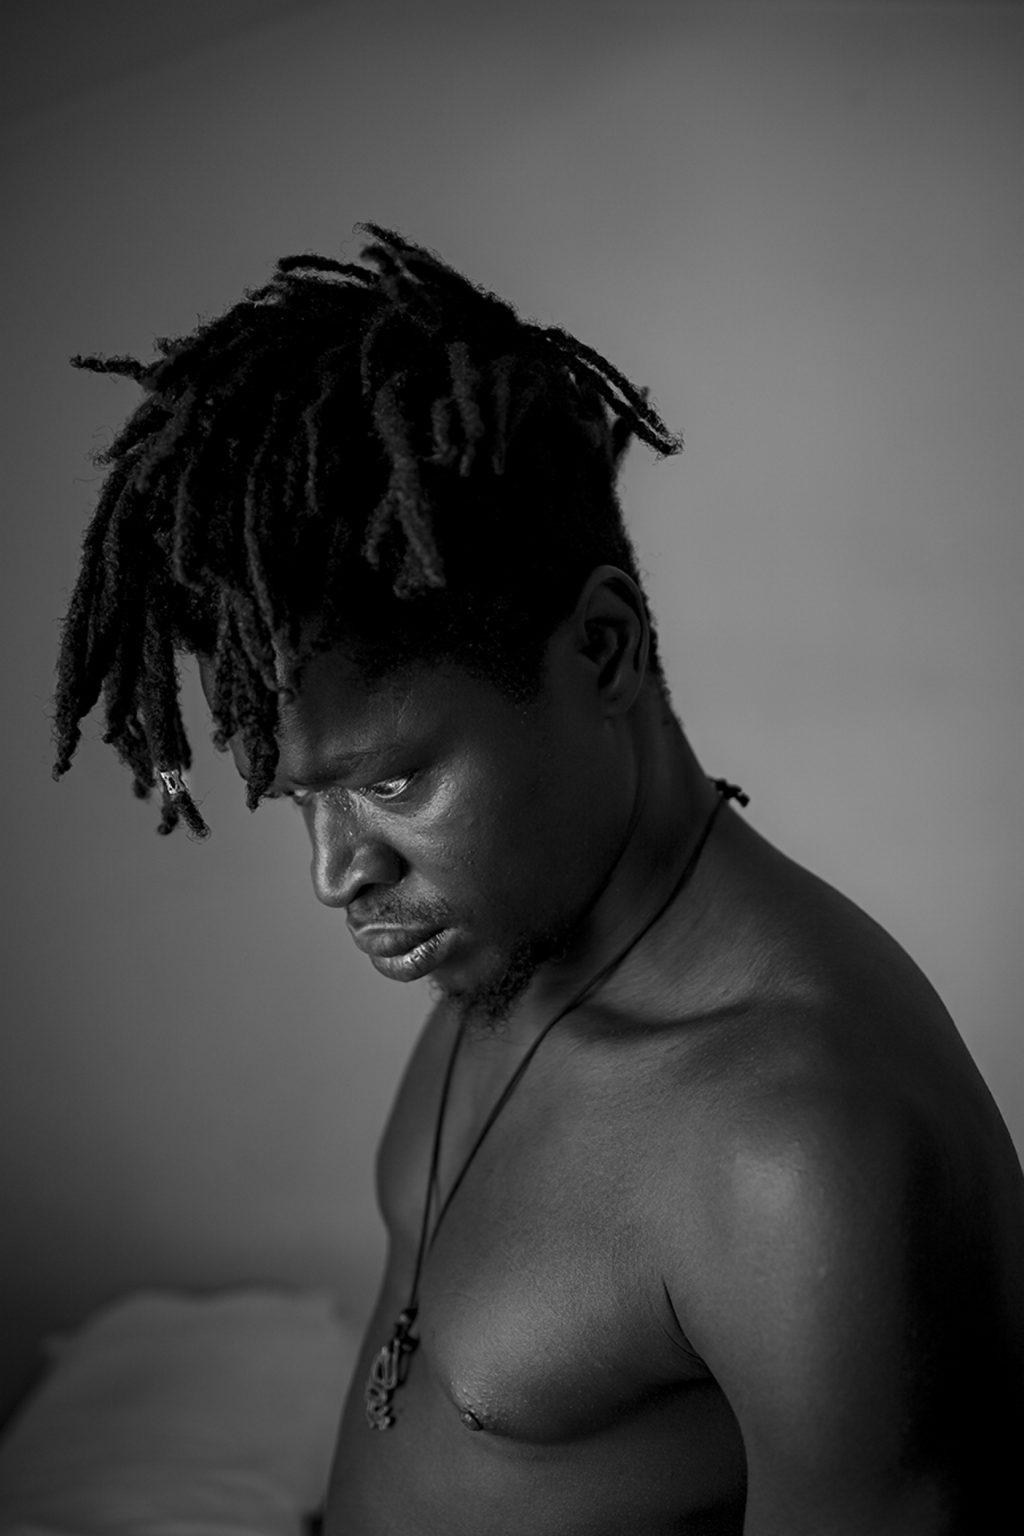 Portrait of Yankuba Zinteh, born in 1992 in Gambia. Reggio Emilia, Italy, 2019